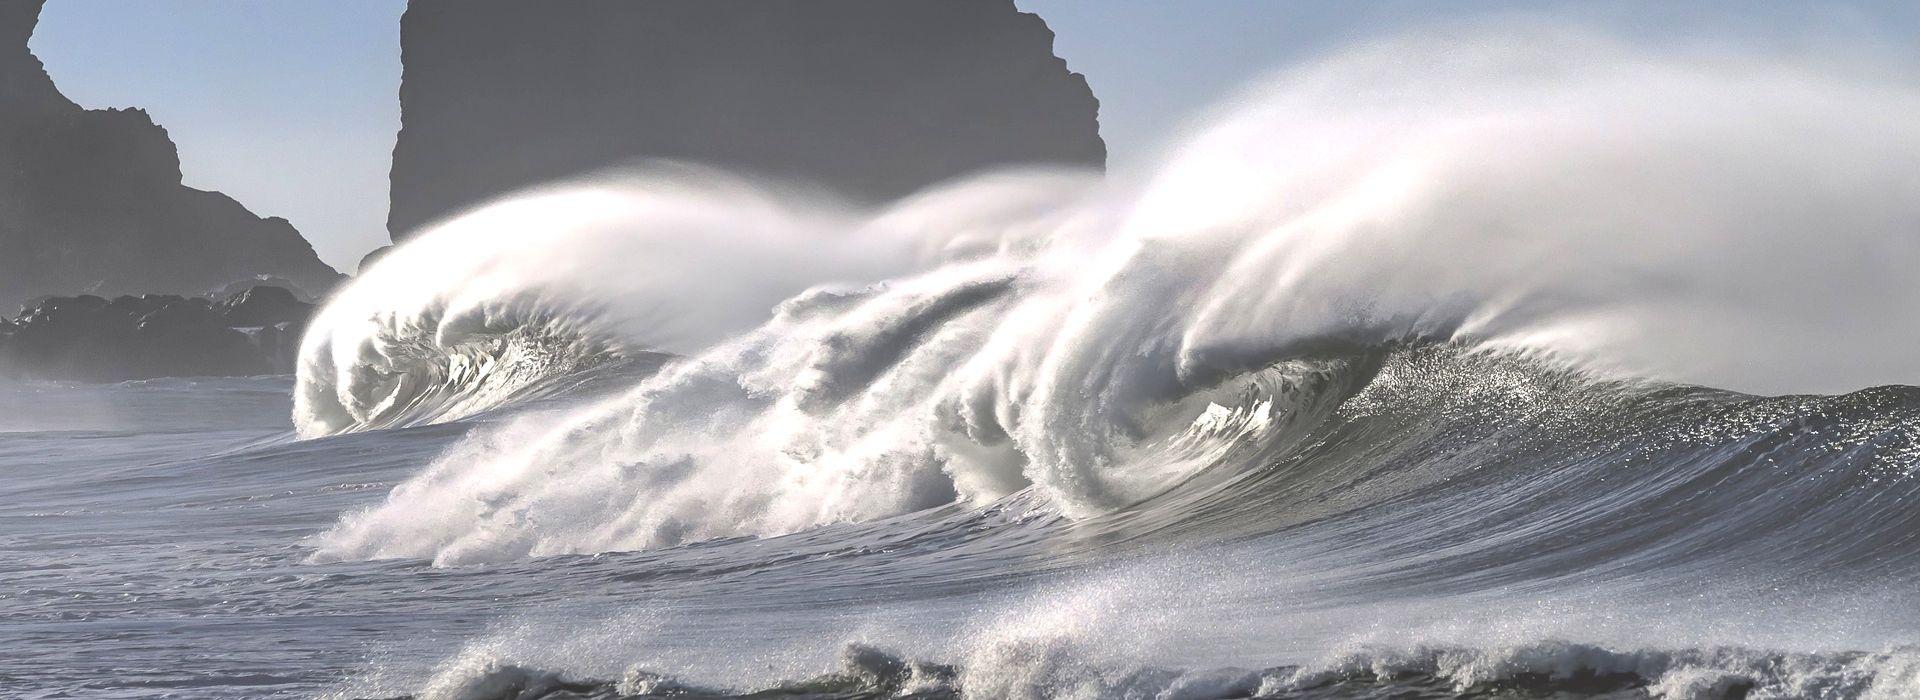 Welle Kraft